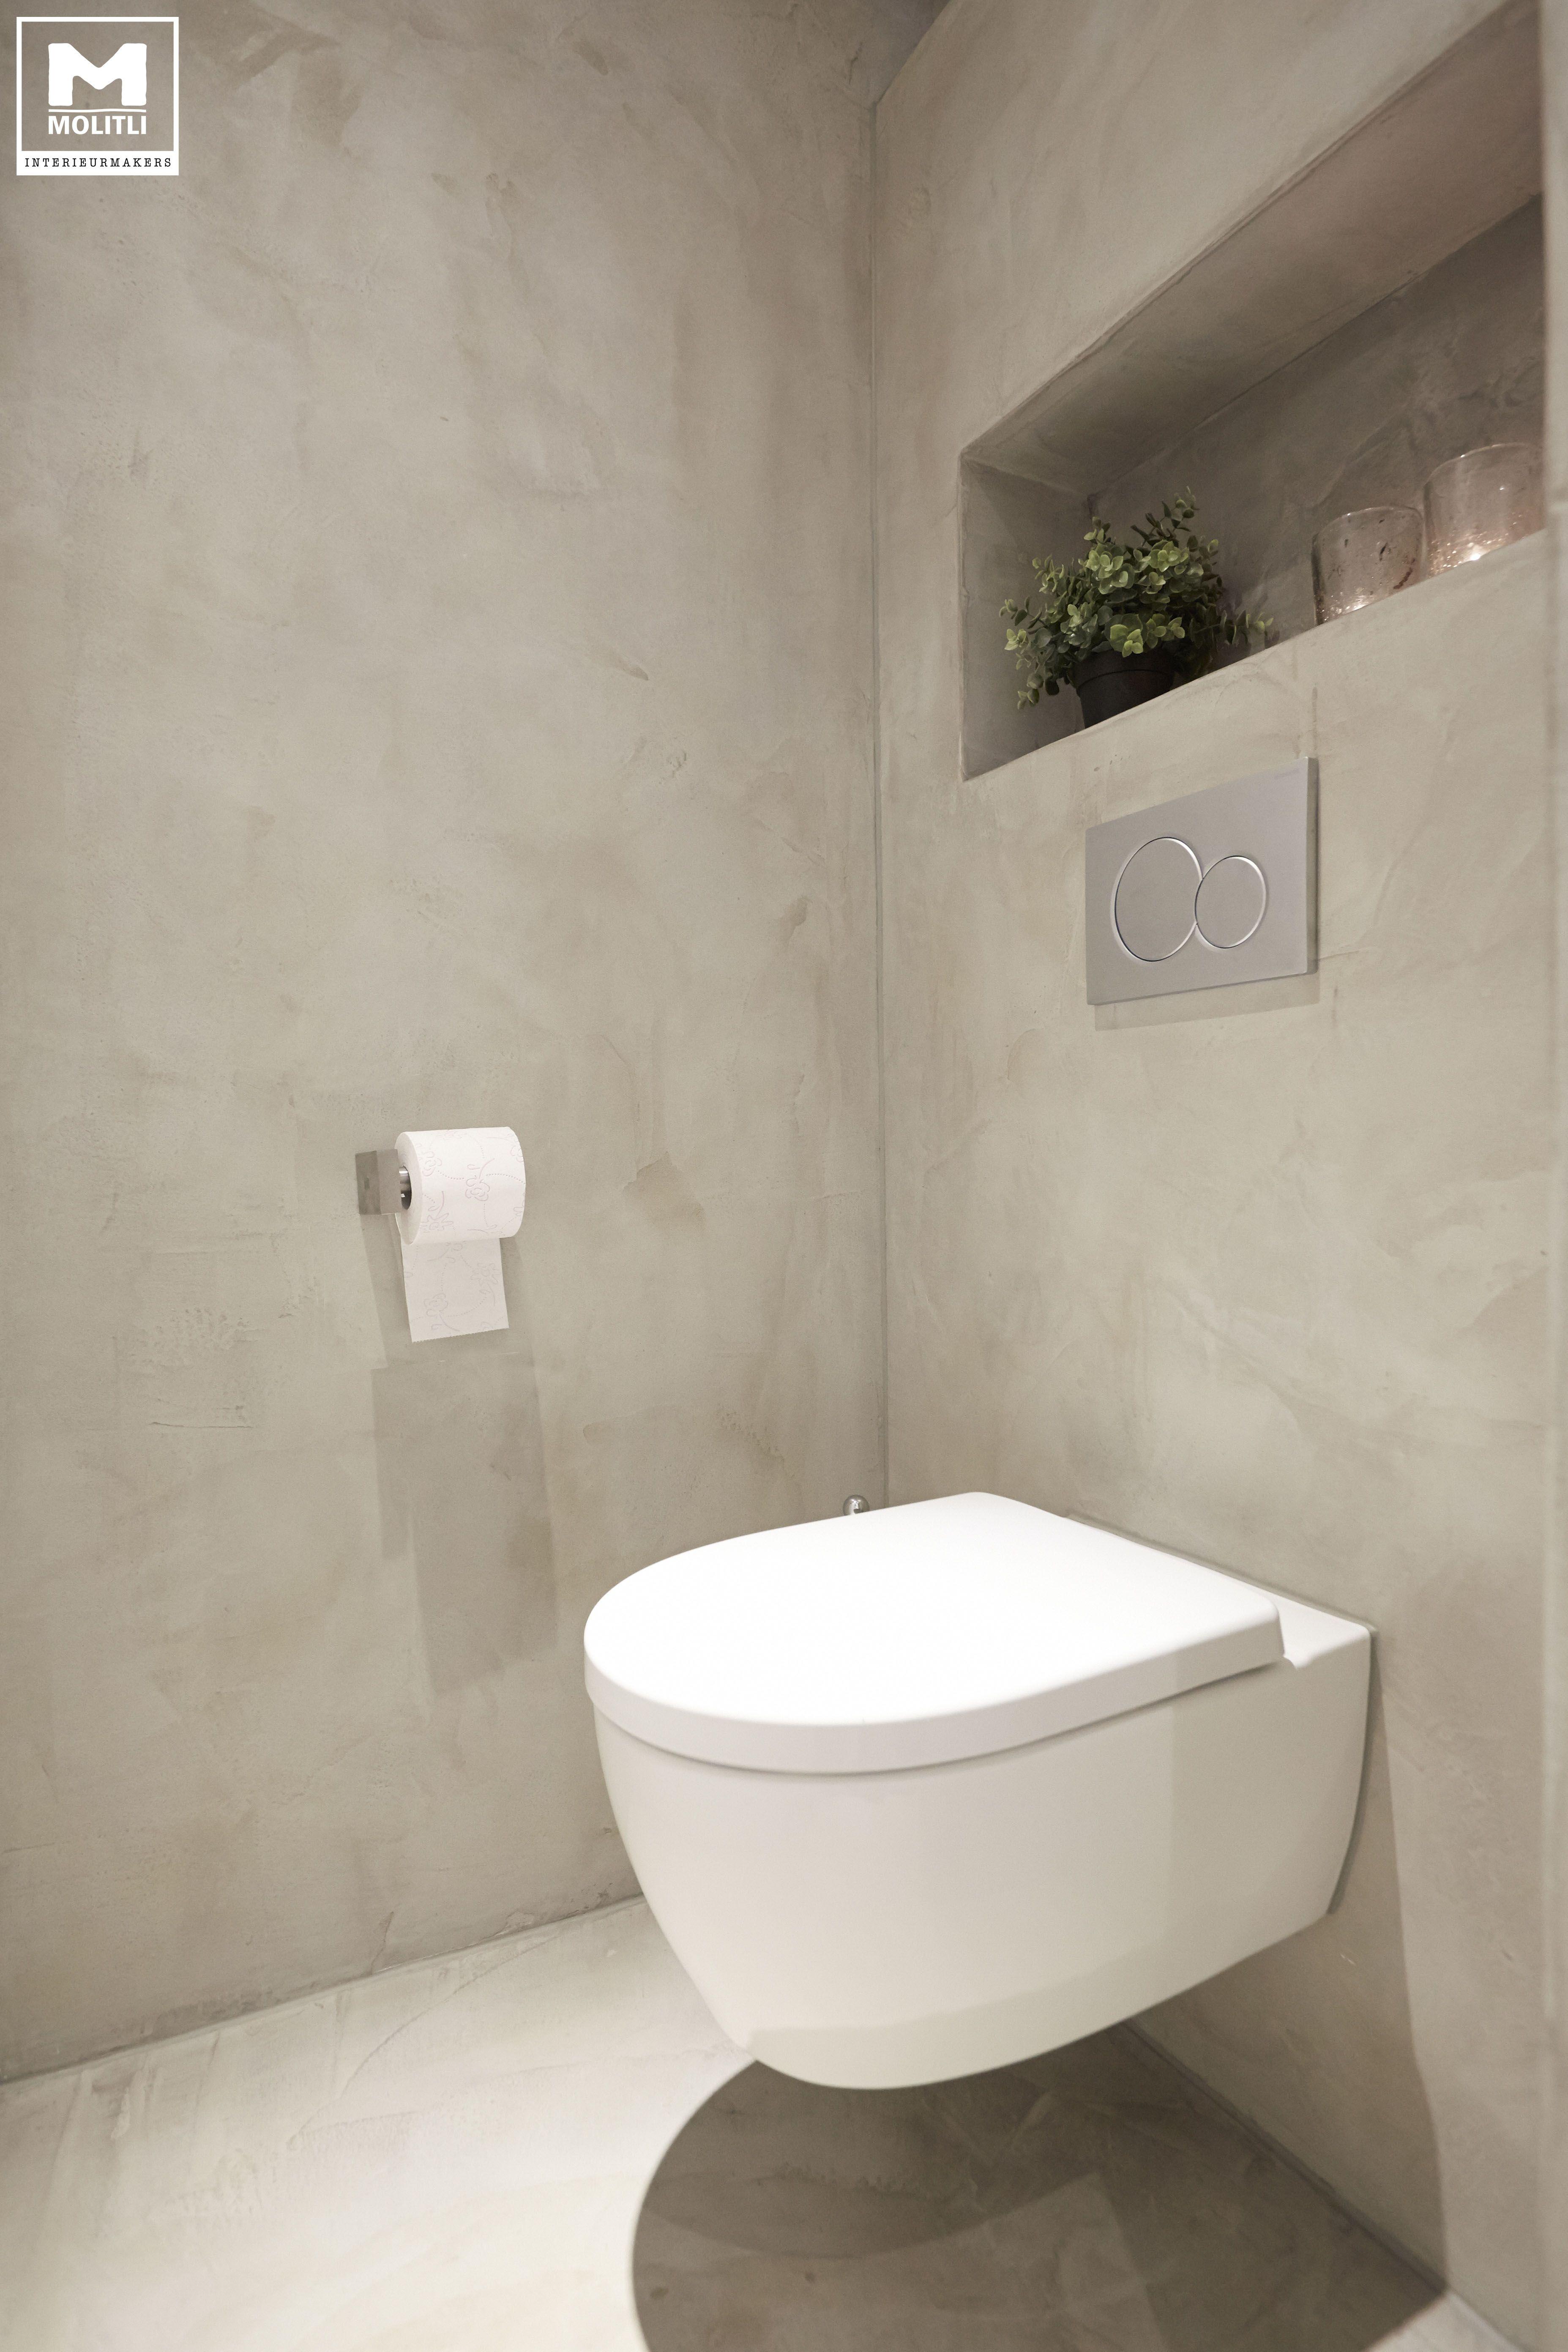 Badkamer betonstuc | Home and Lifestyle | Pinterest | Wohnideen ...